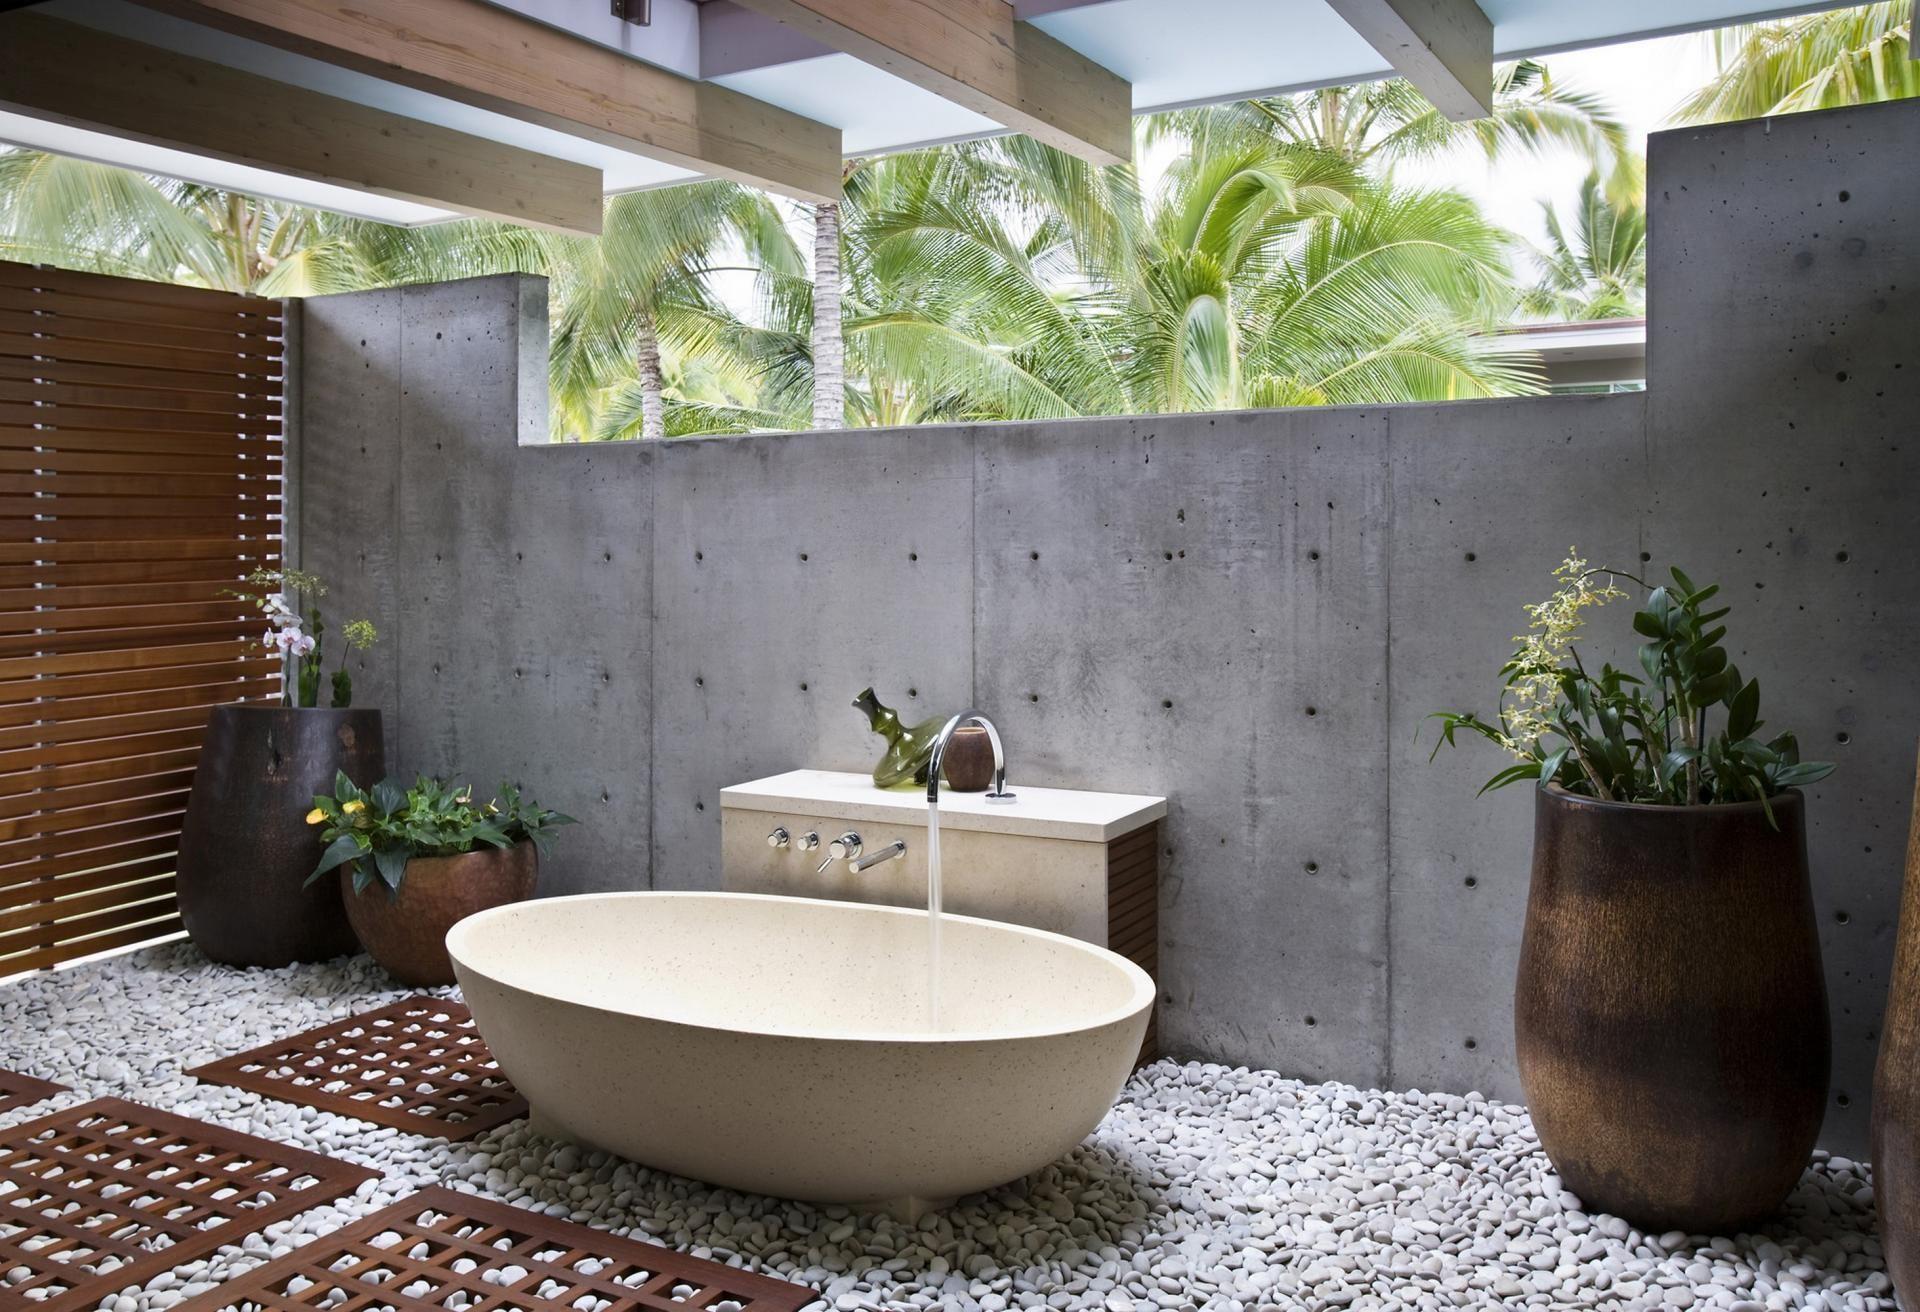 Pin by marsha miller on bathrooms pinterest outdoor bathrooms